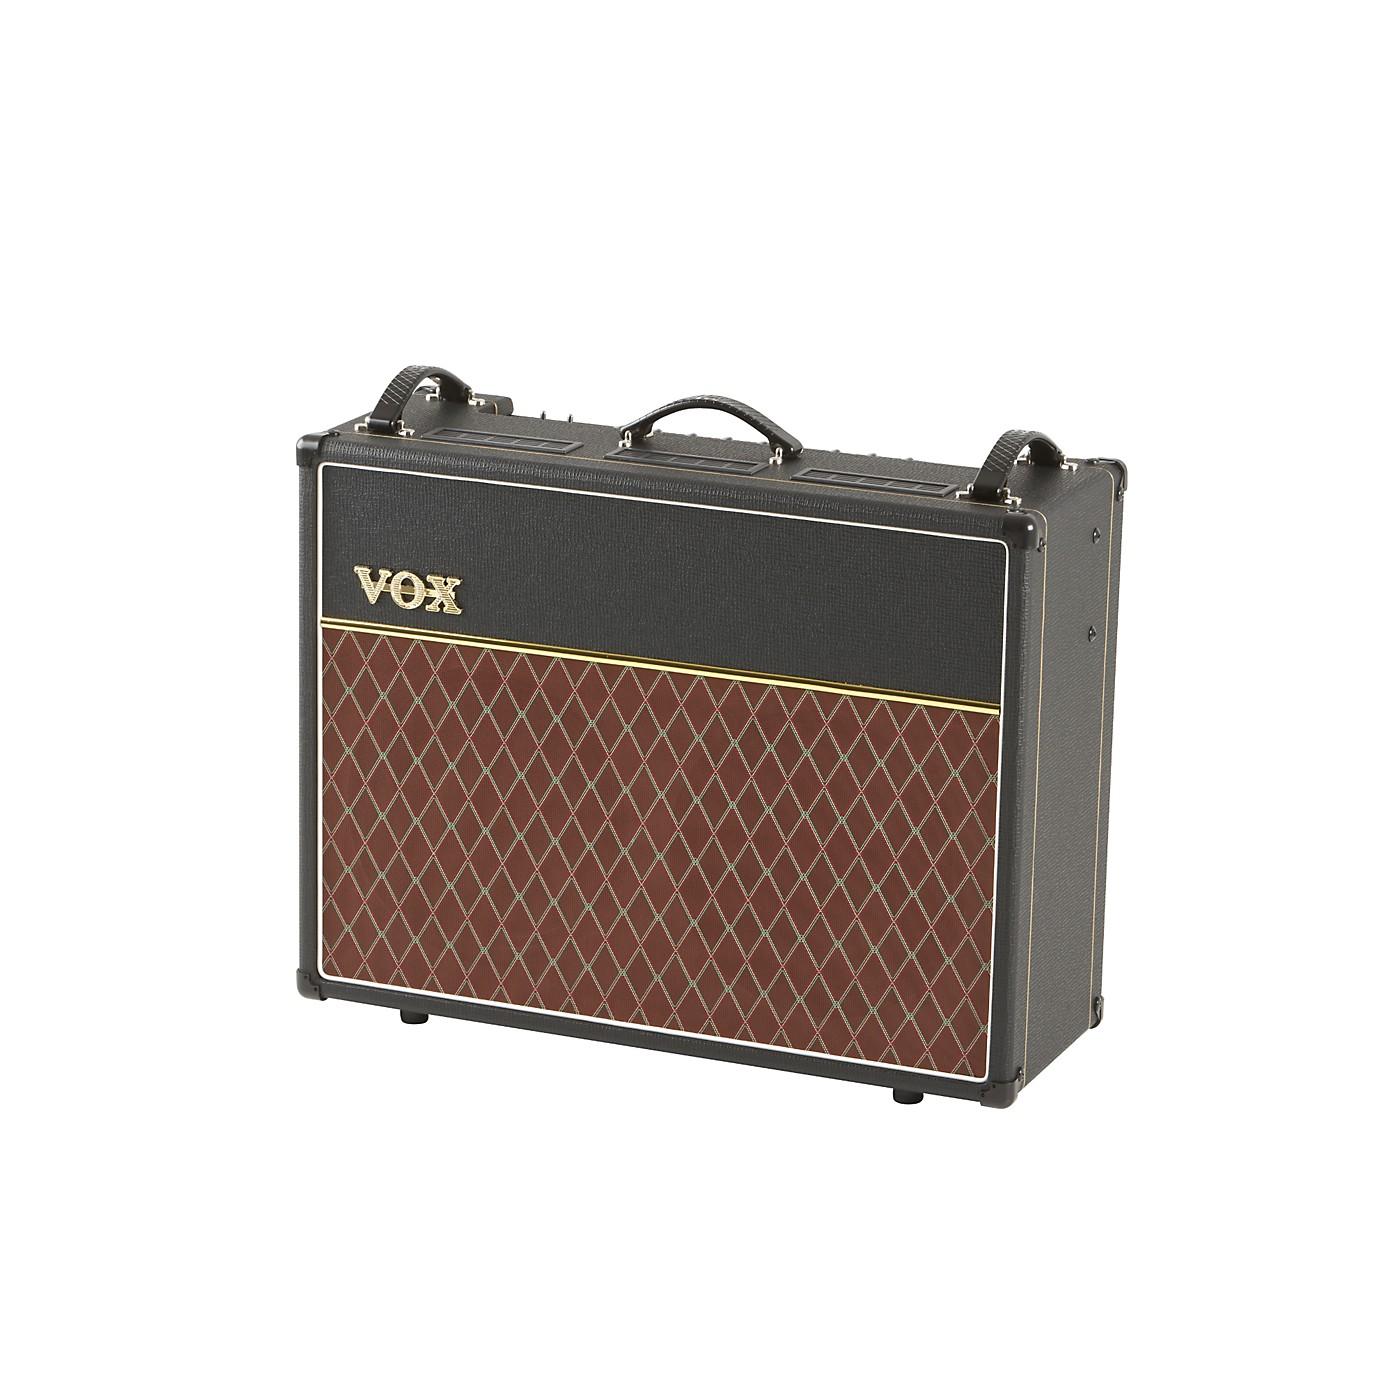 Vox Custom AC15C2 15W 2x12 Tube Guitar Combo Amp thumbnail